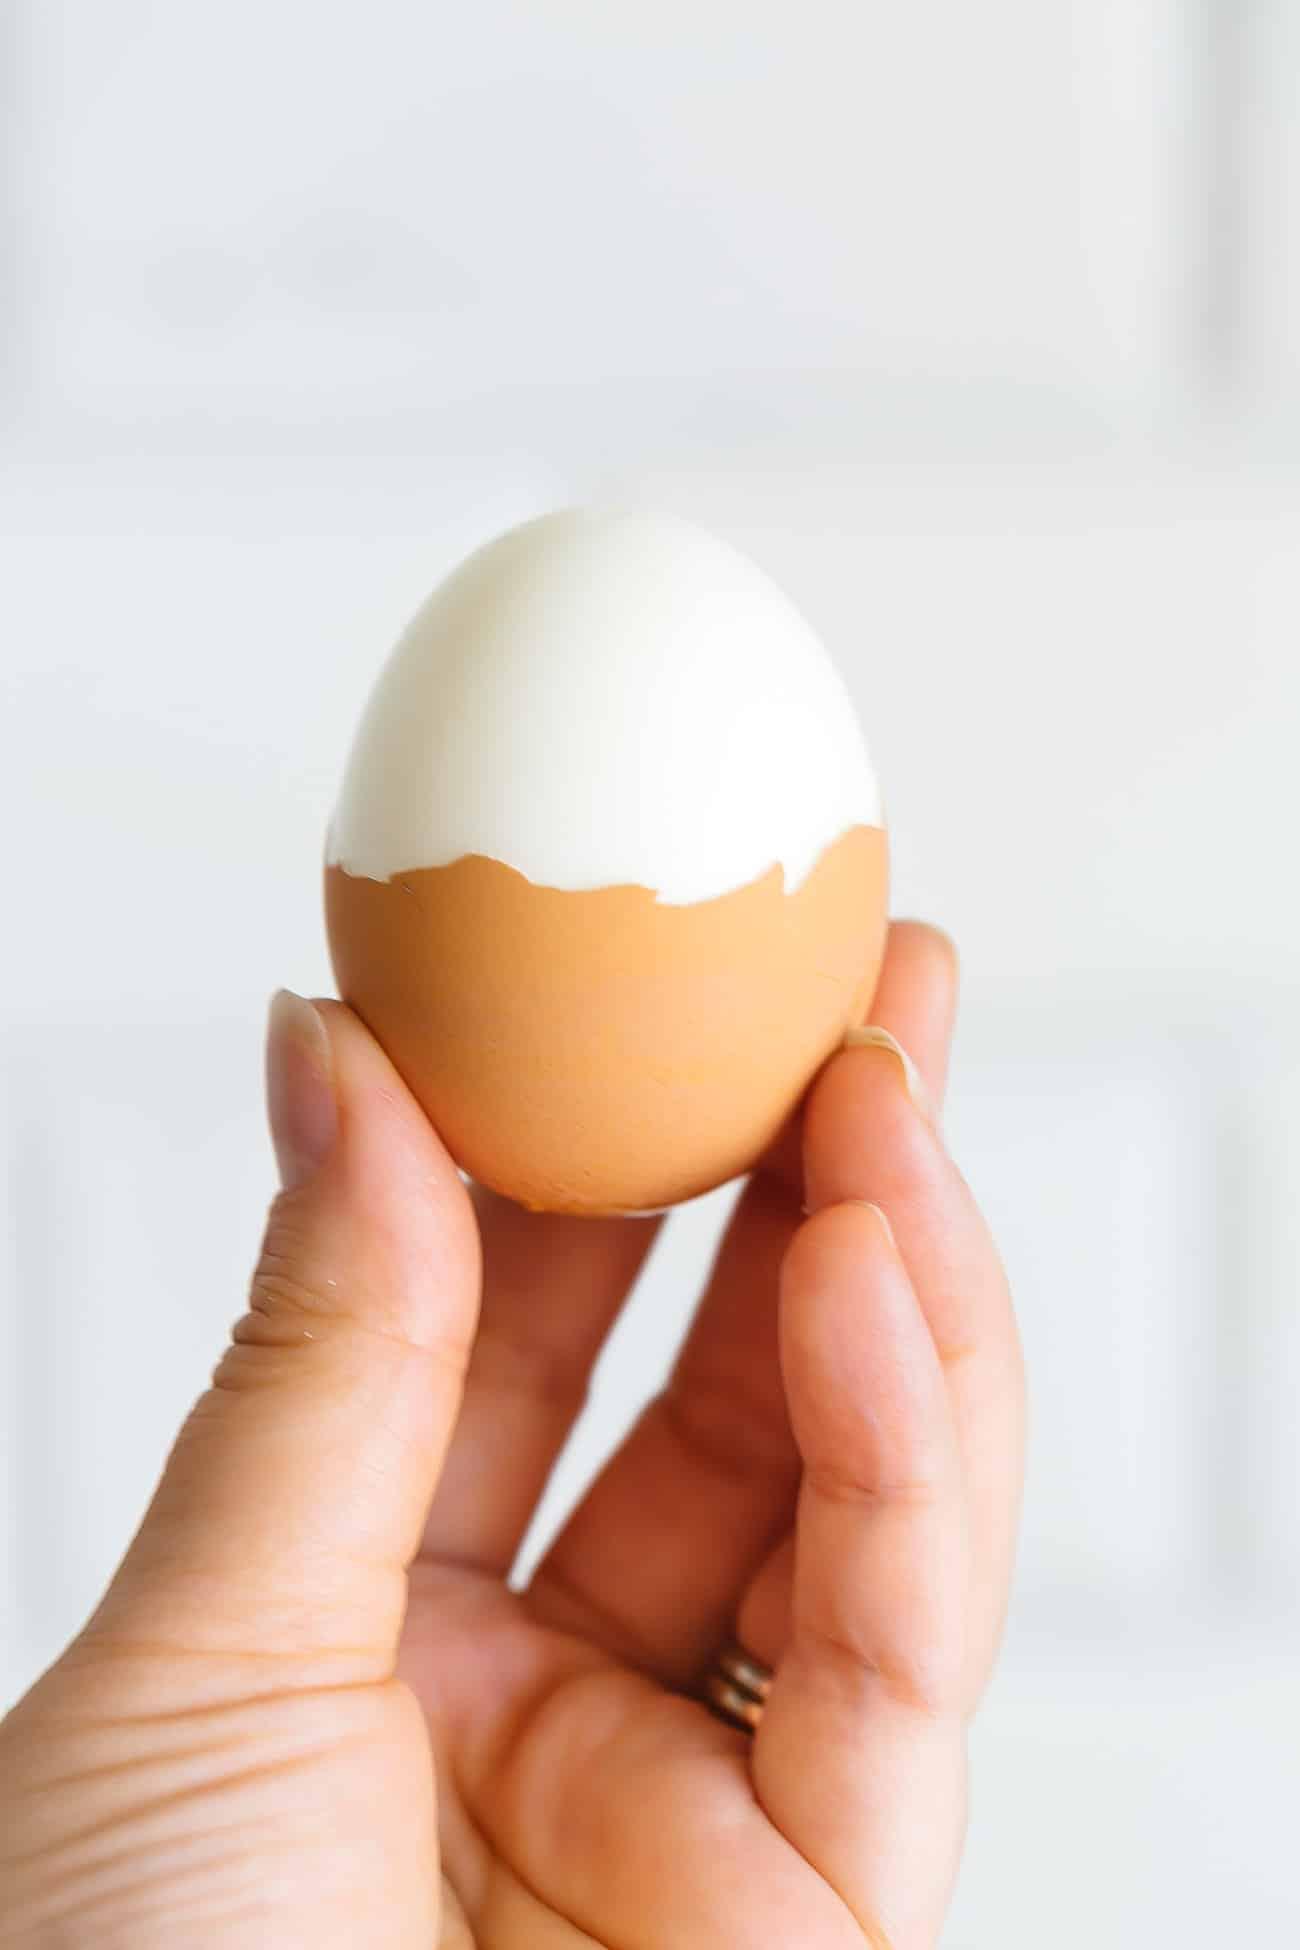 A hand holding a half peeled hard boiled egg.